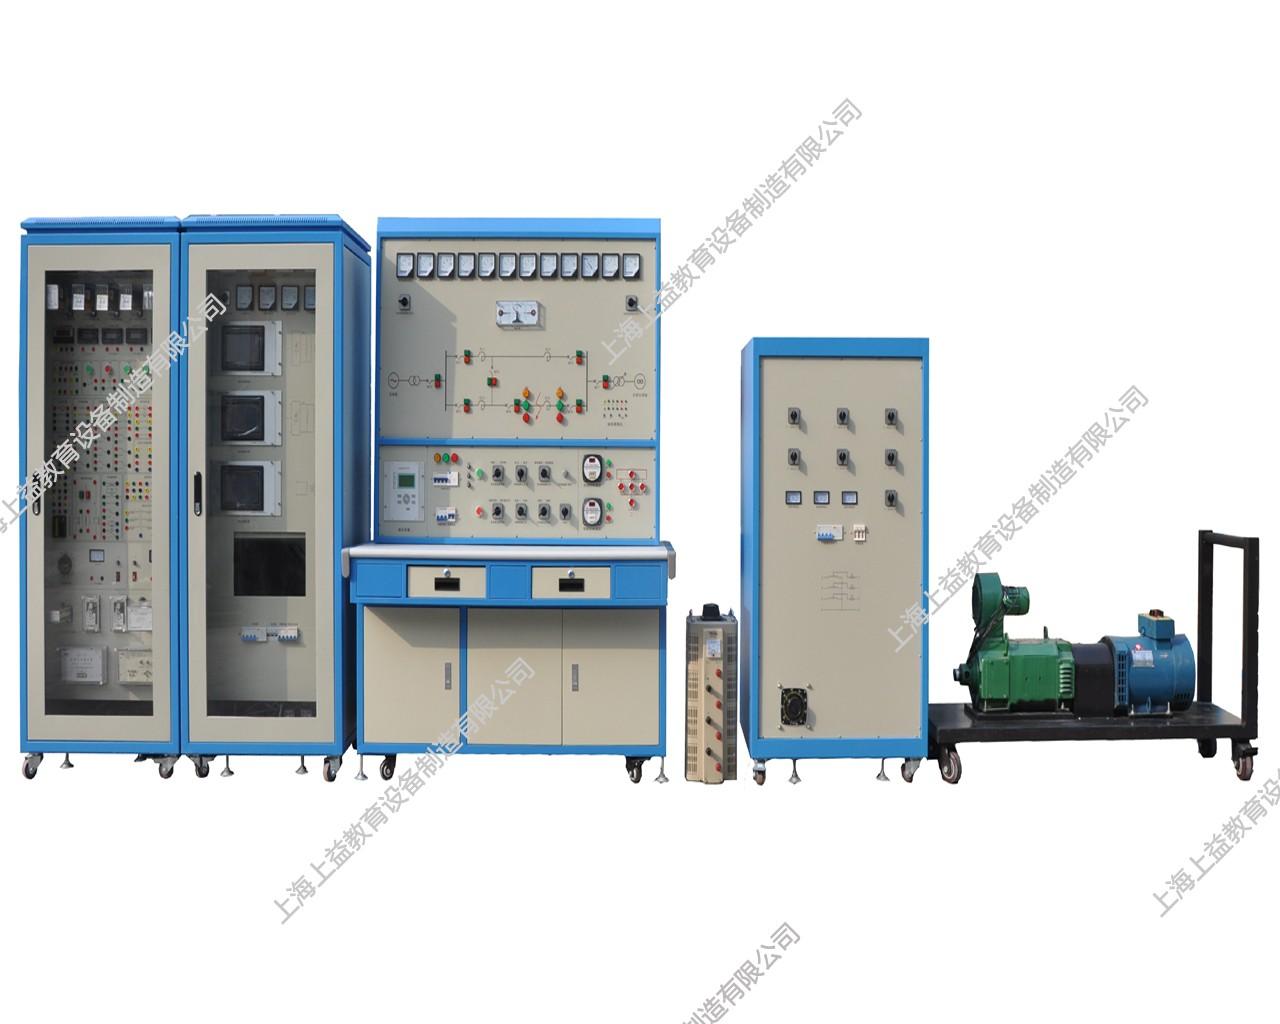 SYDLZD-05电力系统自动化wwwlehu8vip平台